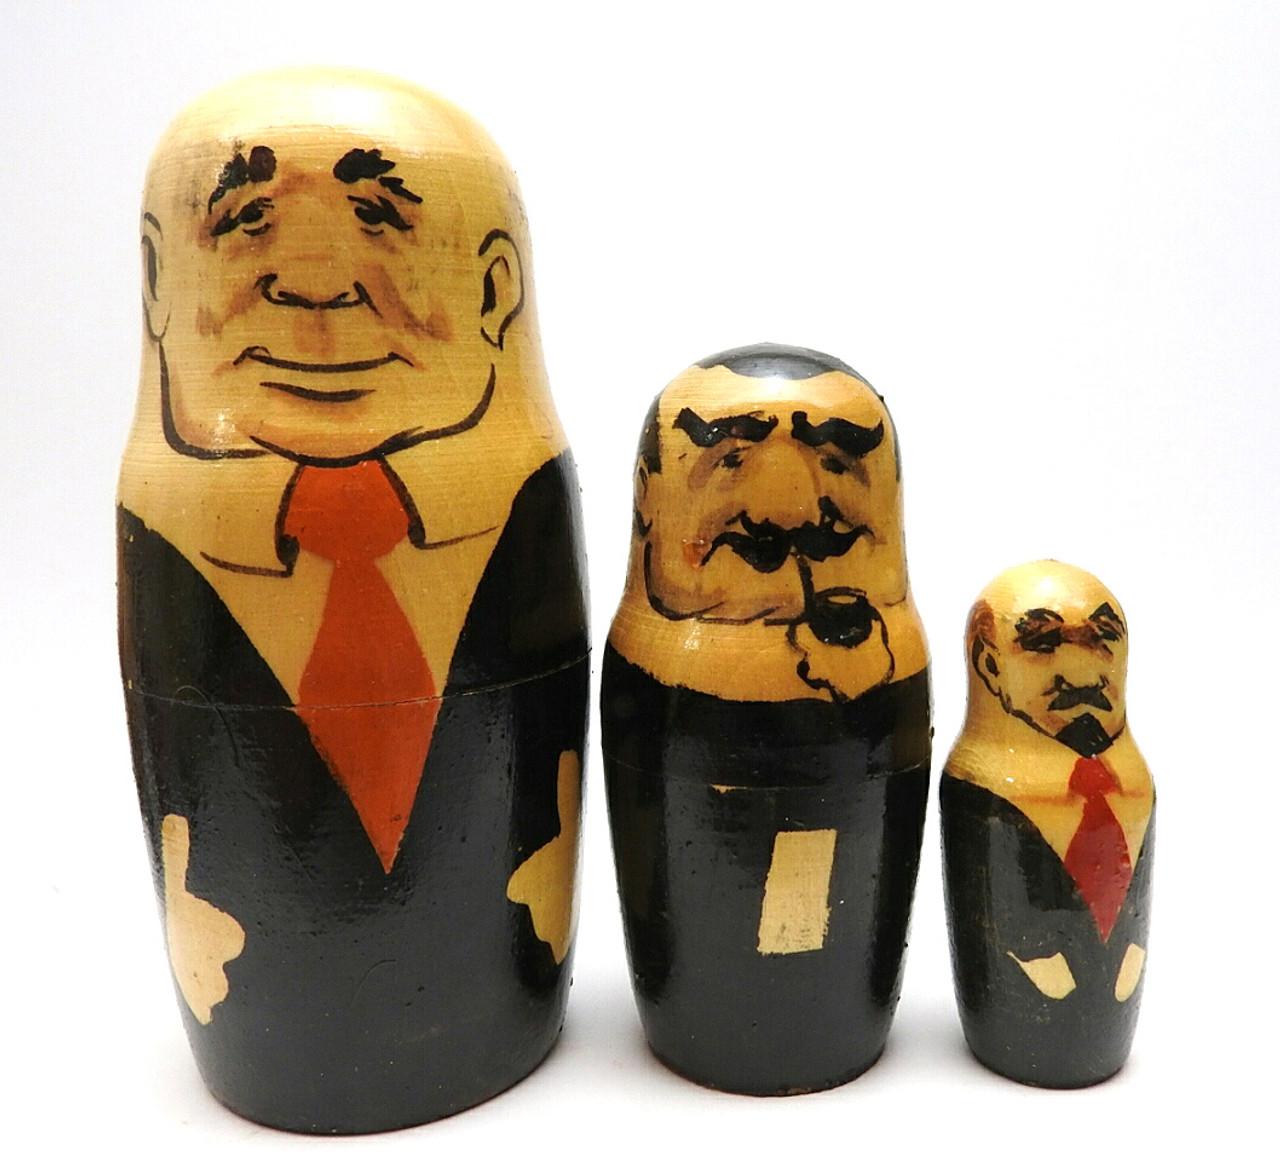 Khrushchev, Stalin and Lenin in the set Gorbachev with Men in Black Communist Leaders